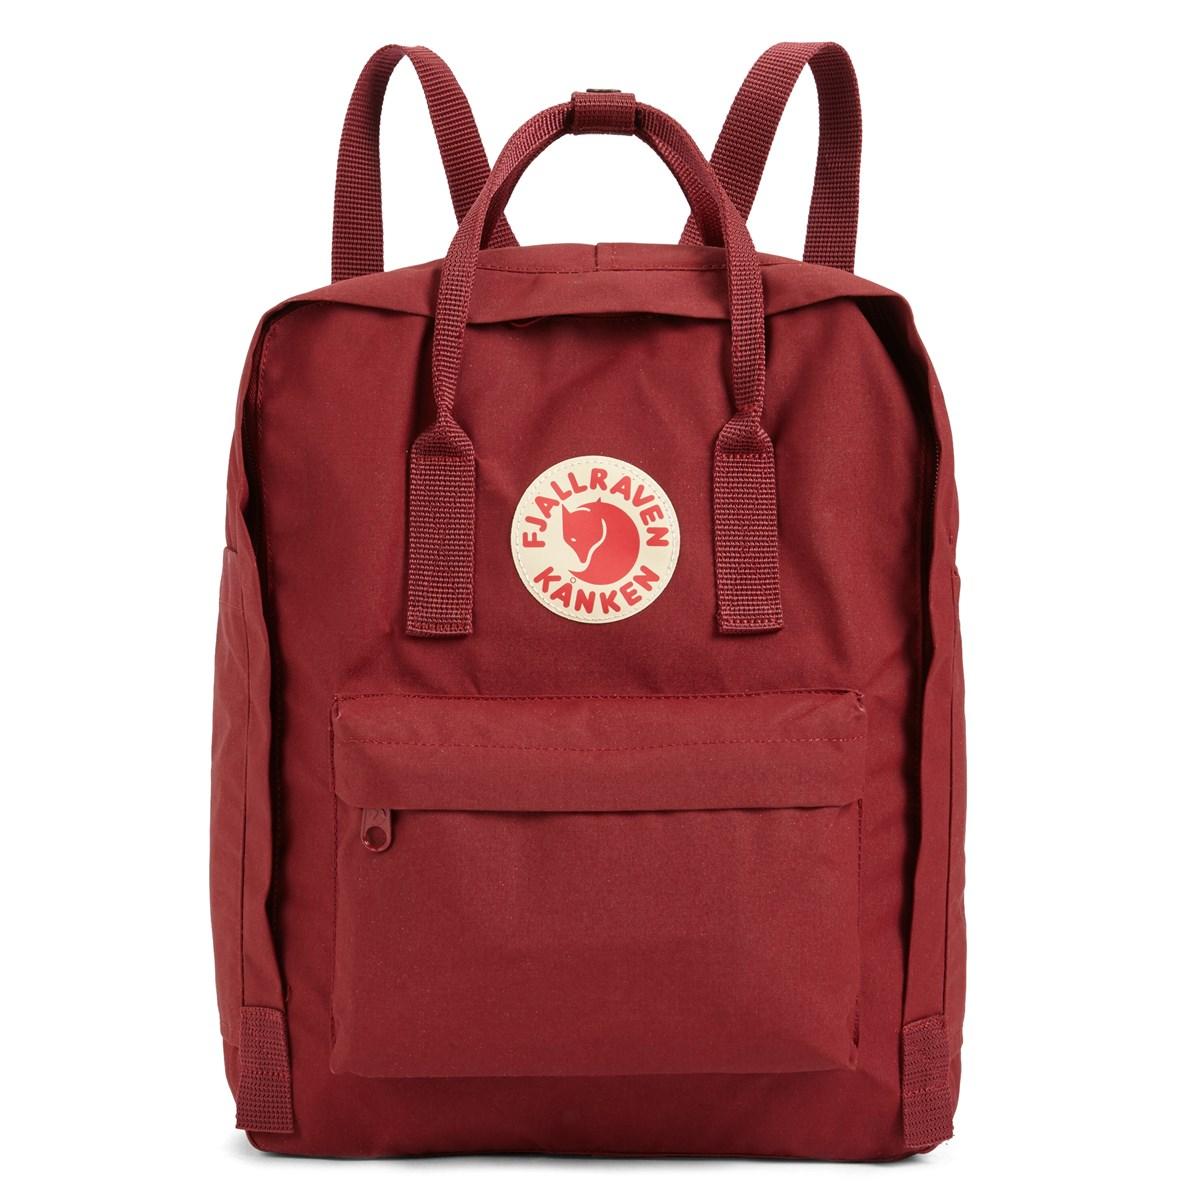 Kanken Red Backpack Little Burgundy